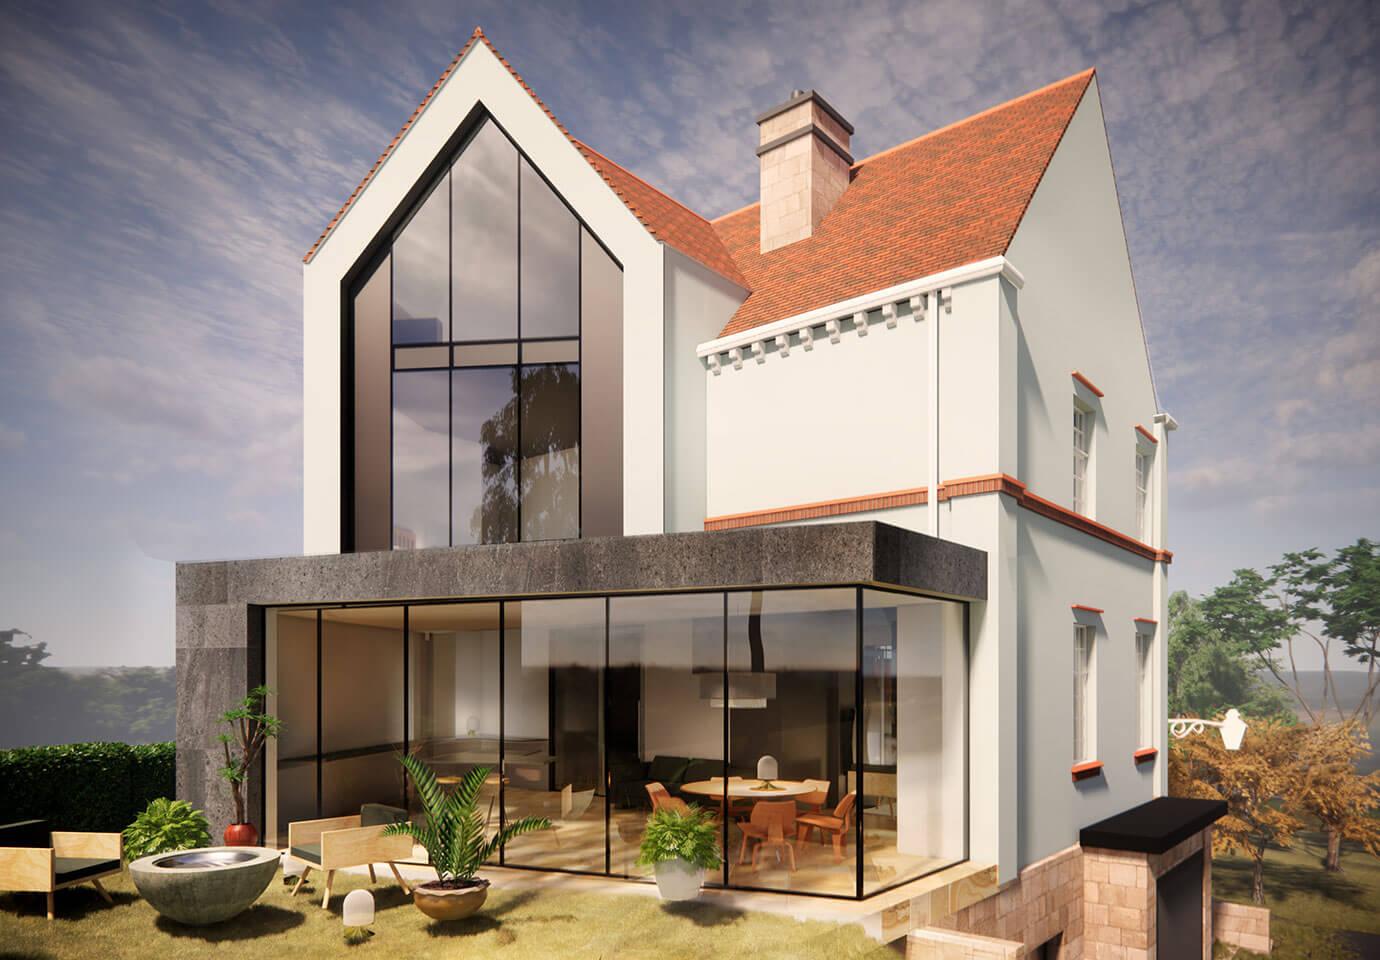 Silverdale-Crescent,-Sheffield-Architect